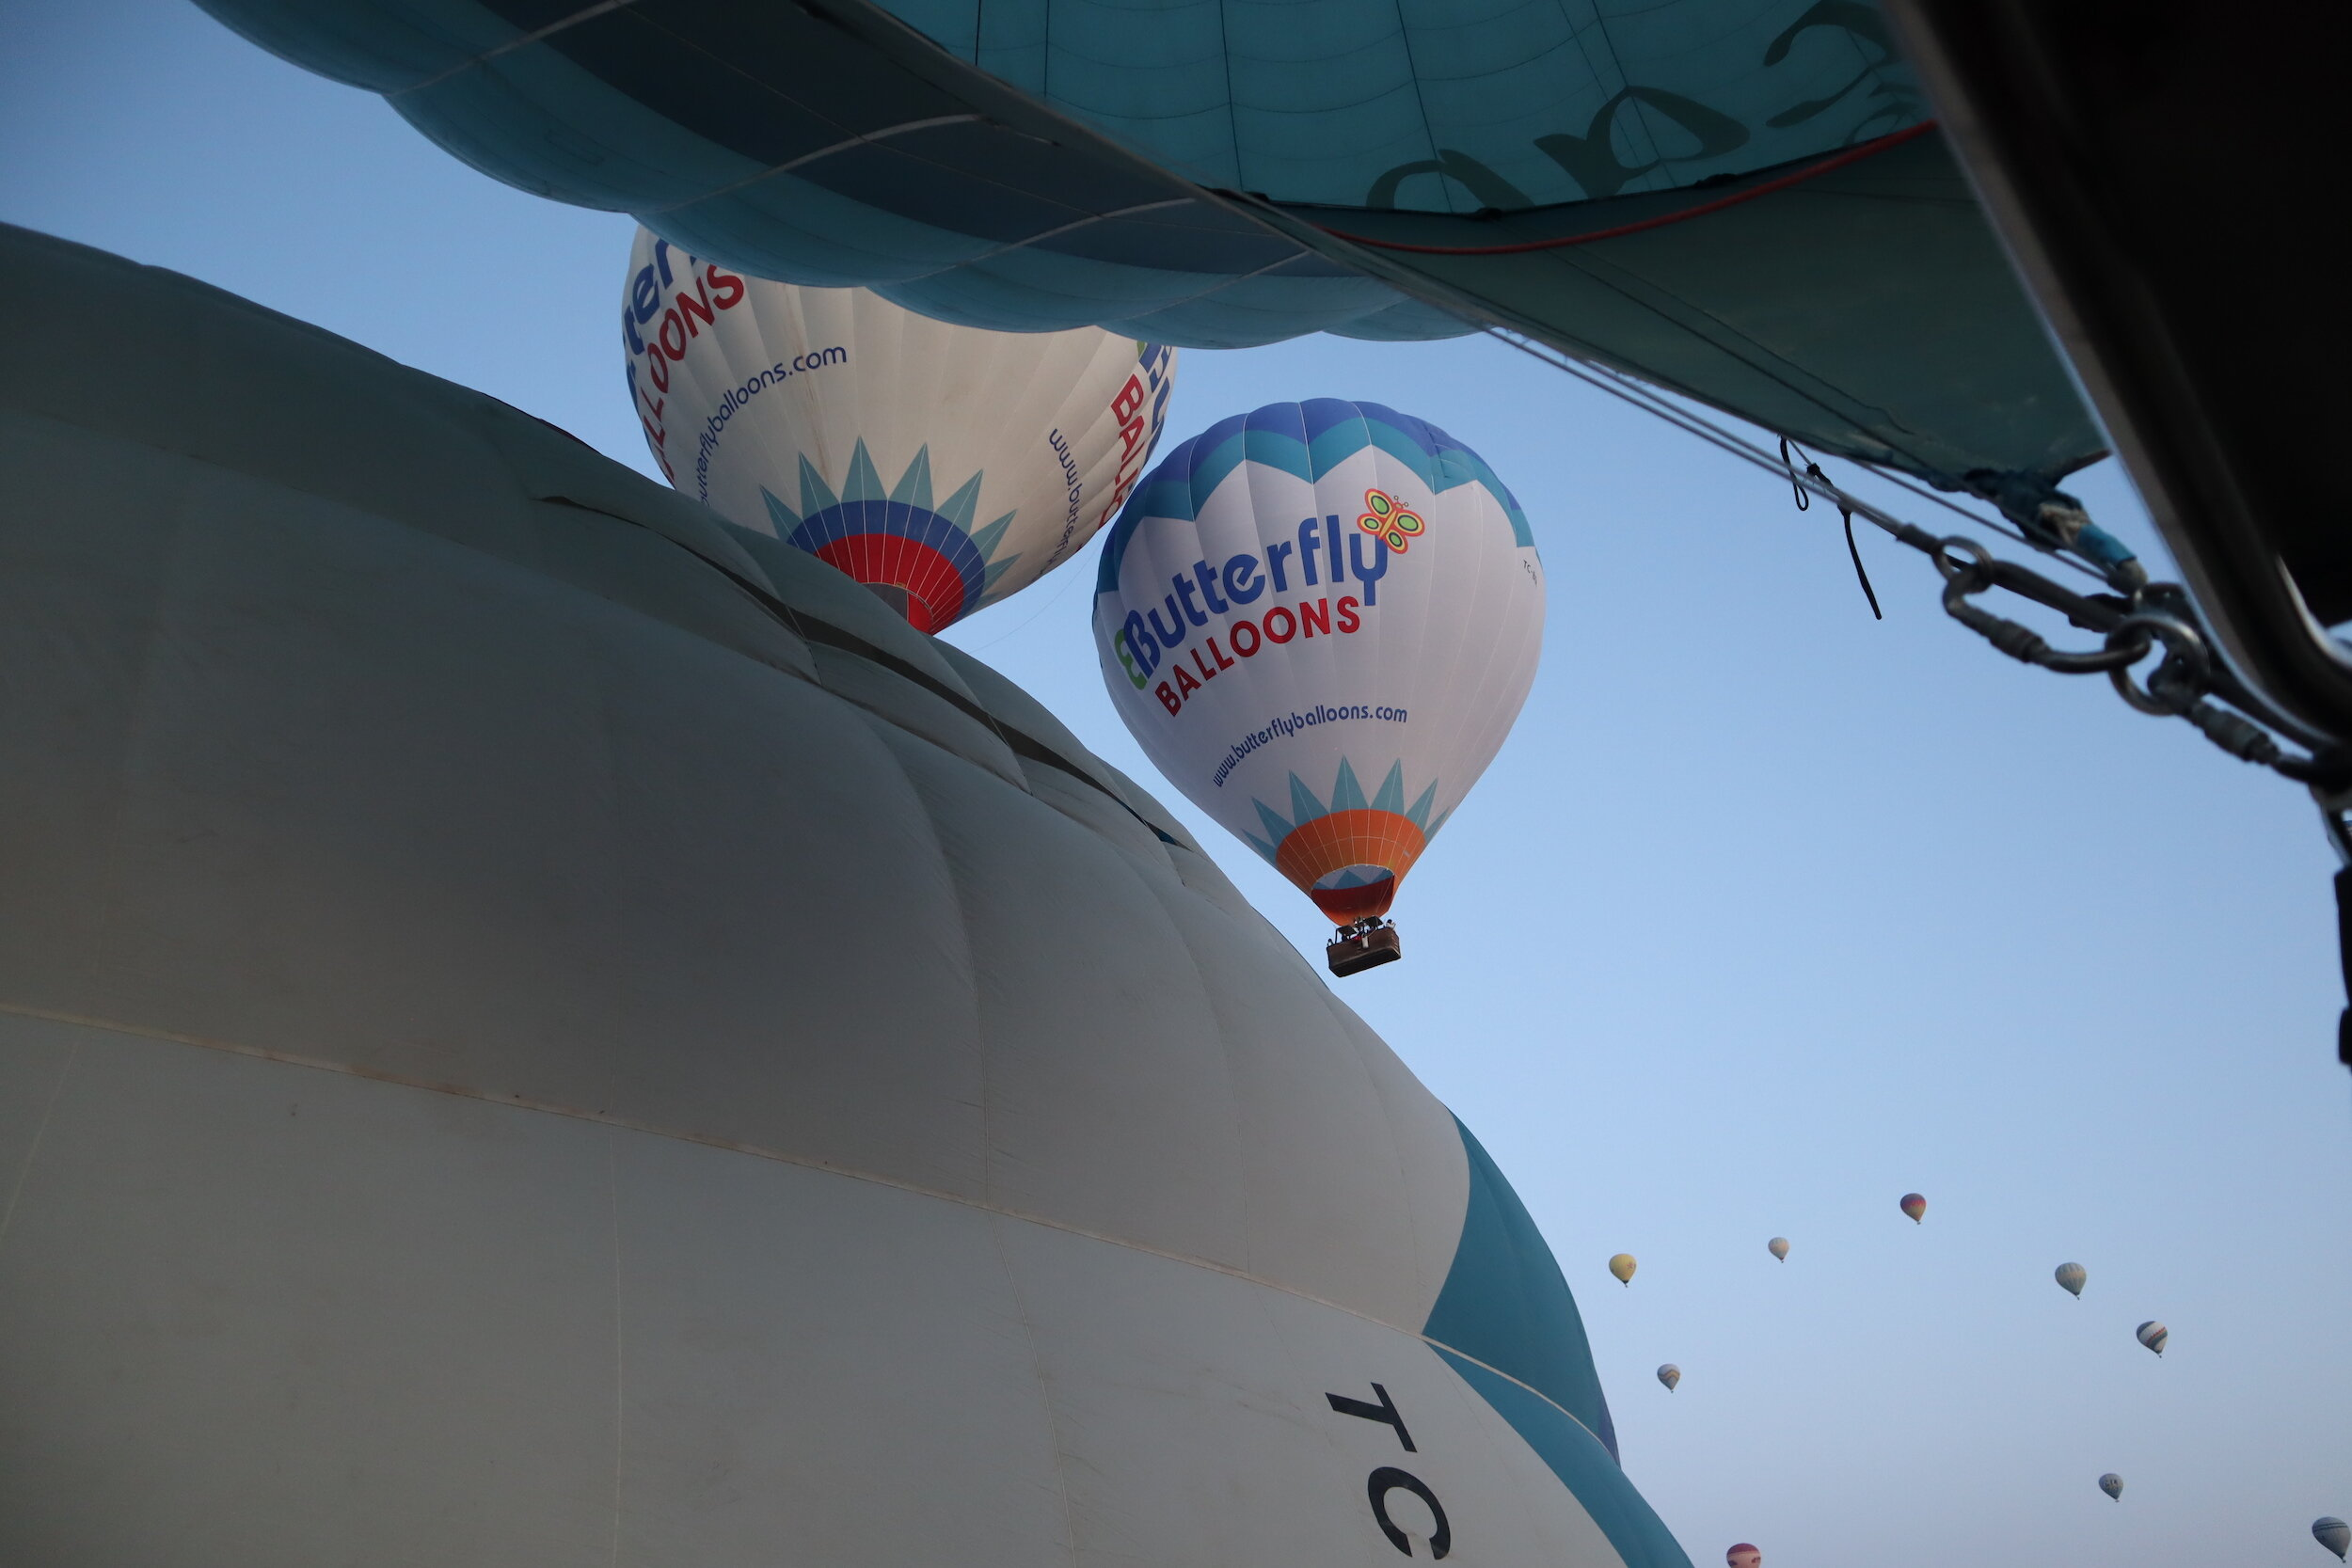 5am lift-off